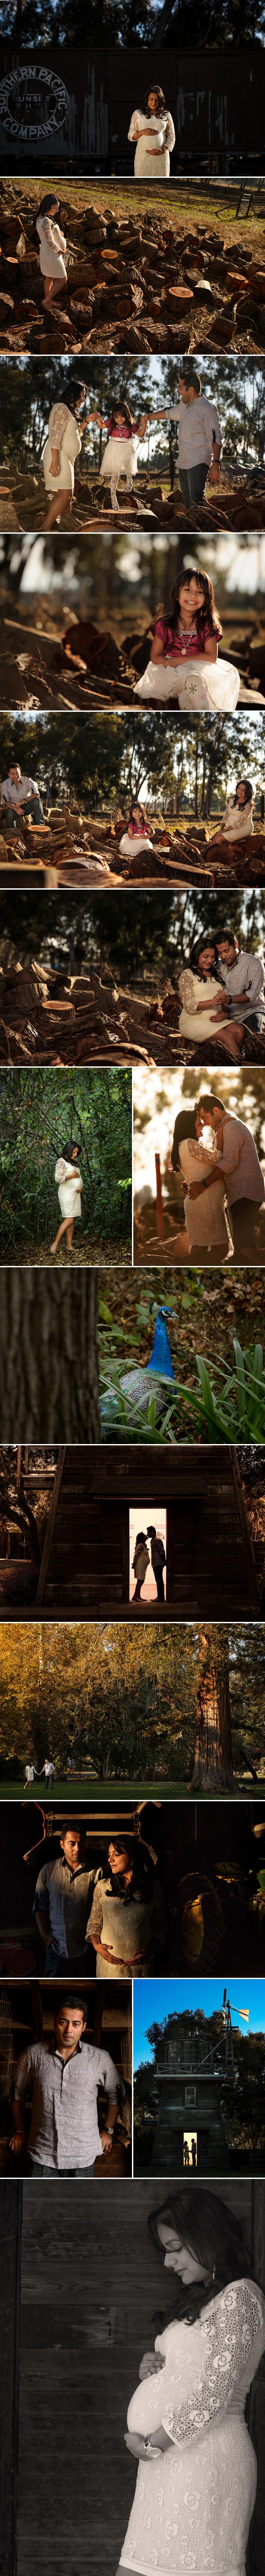 Maternity Shoot Collage.jpg